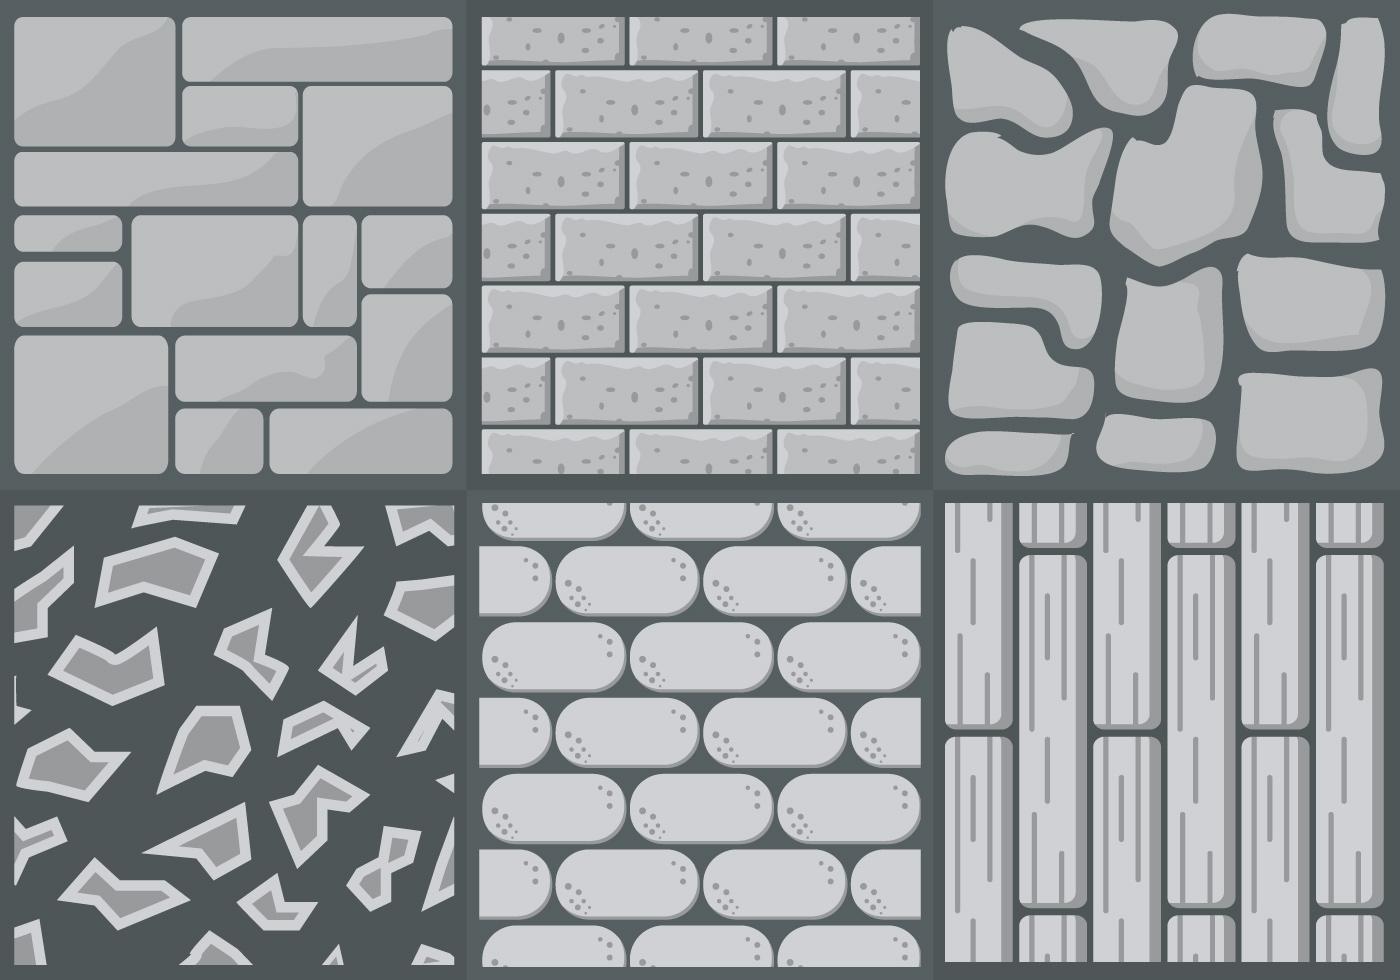 cartoon square stones texture - photo #15